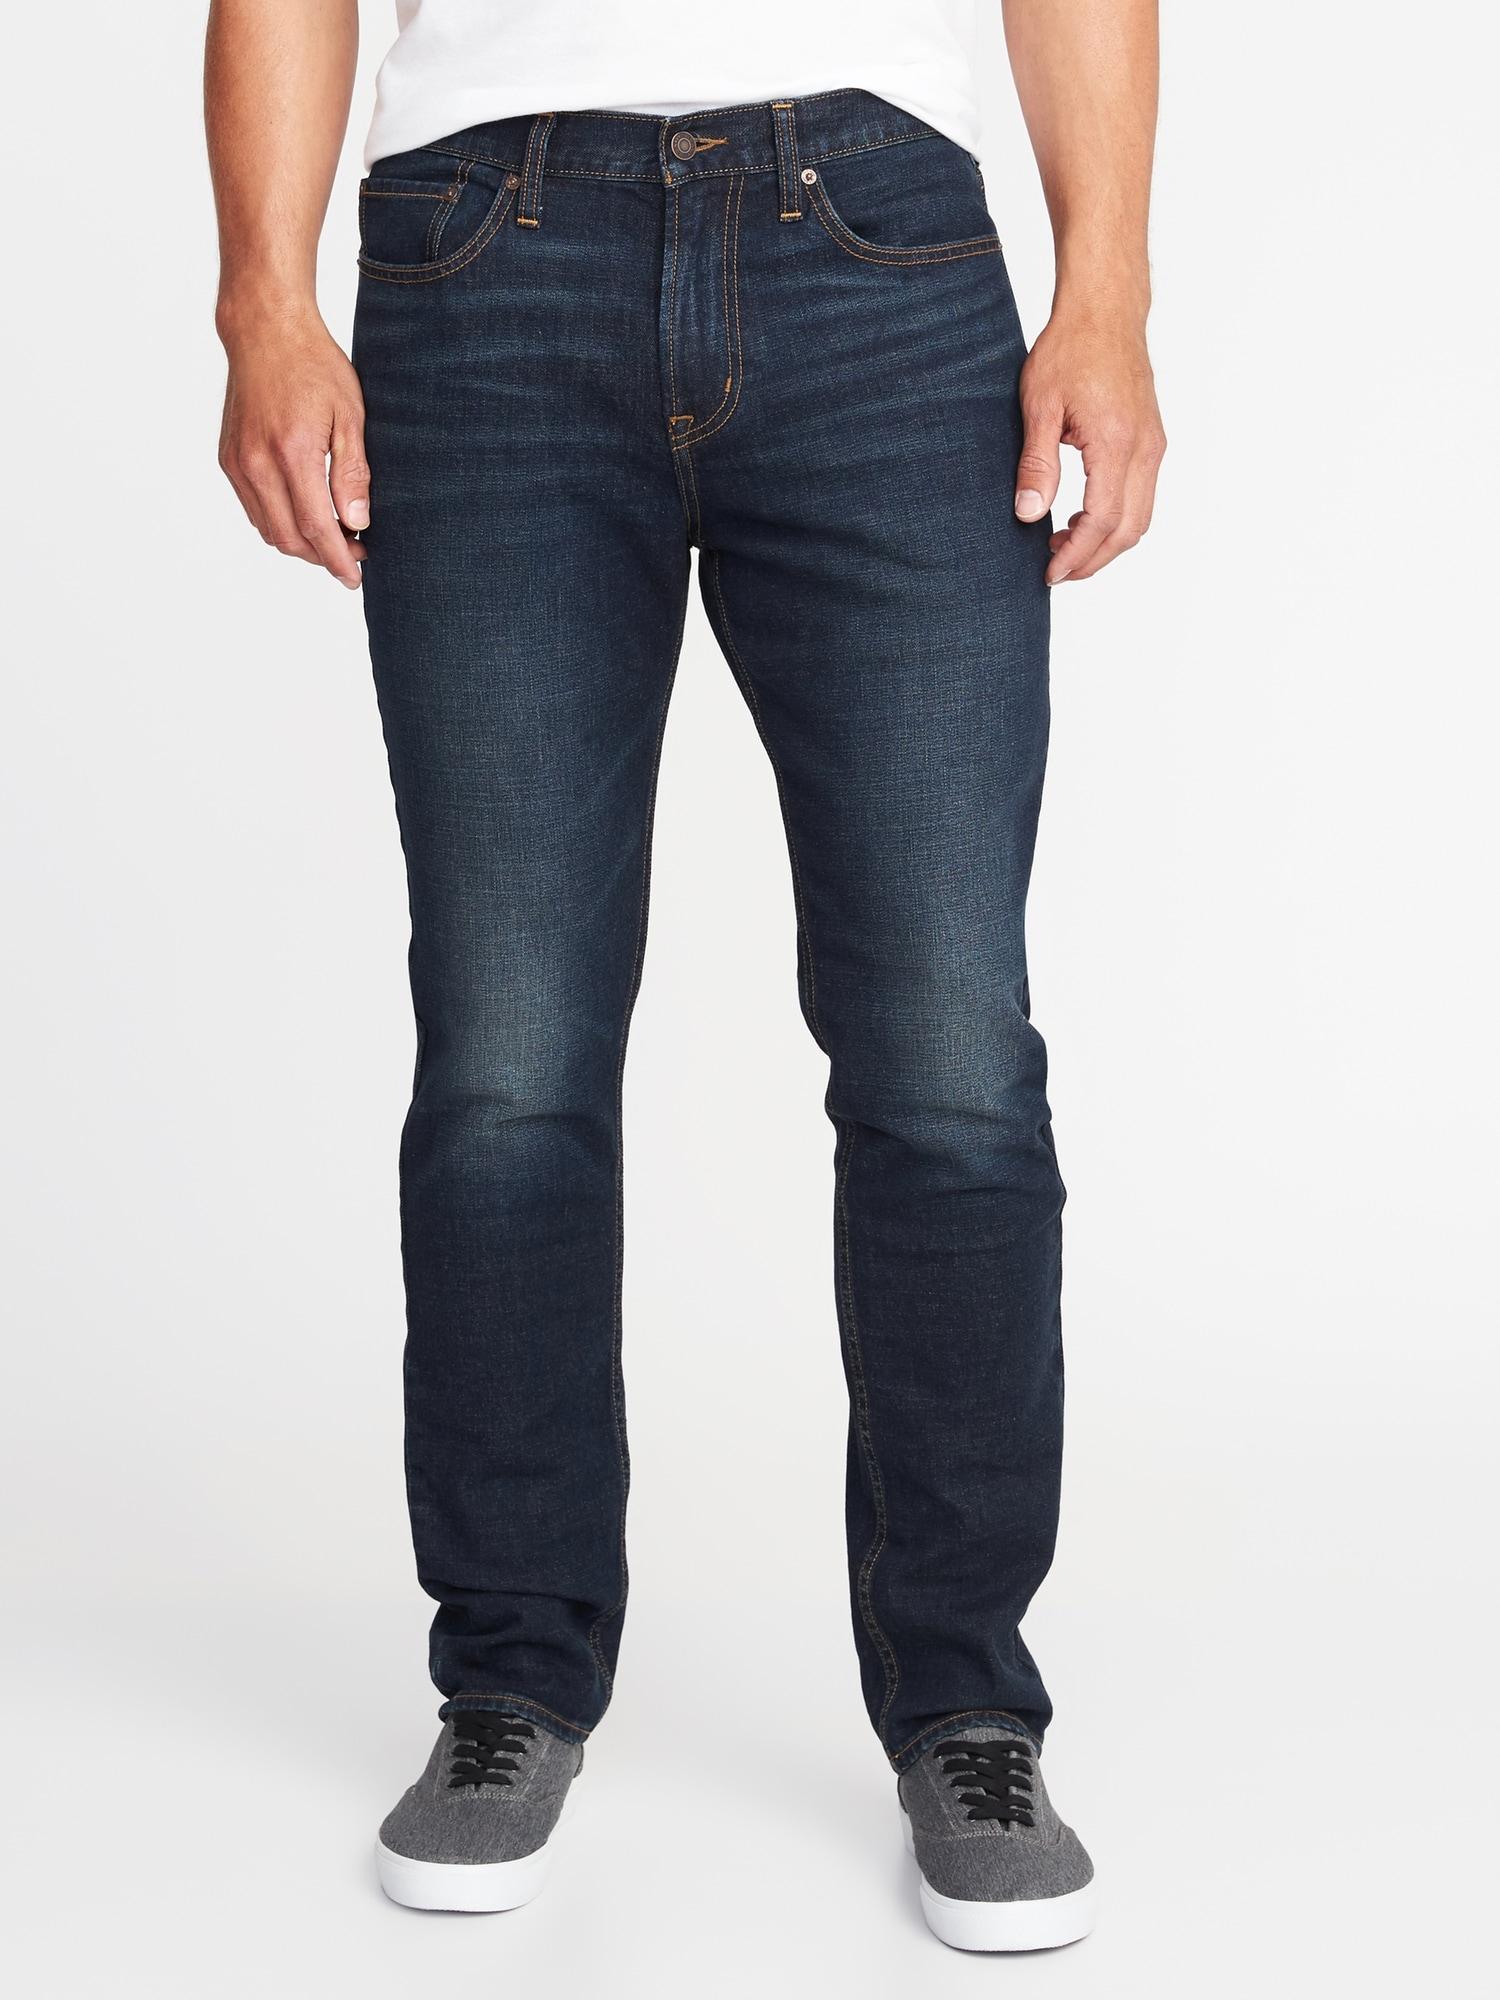 دقيق تك المثالي Flex Jeans Cabuildingbridges Org